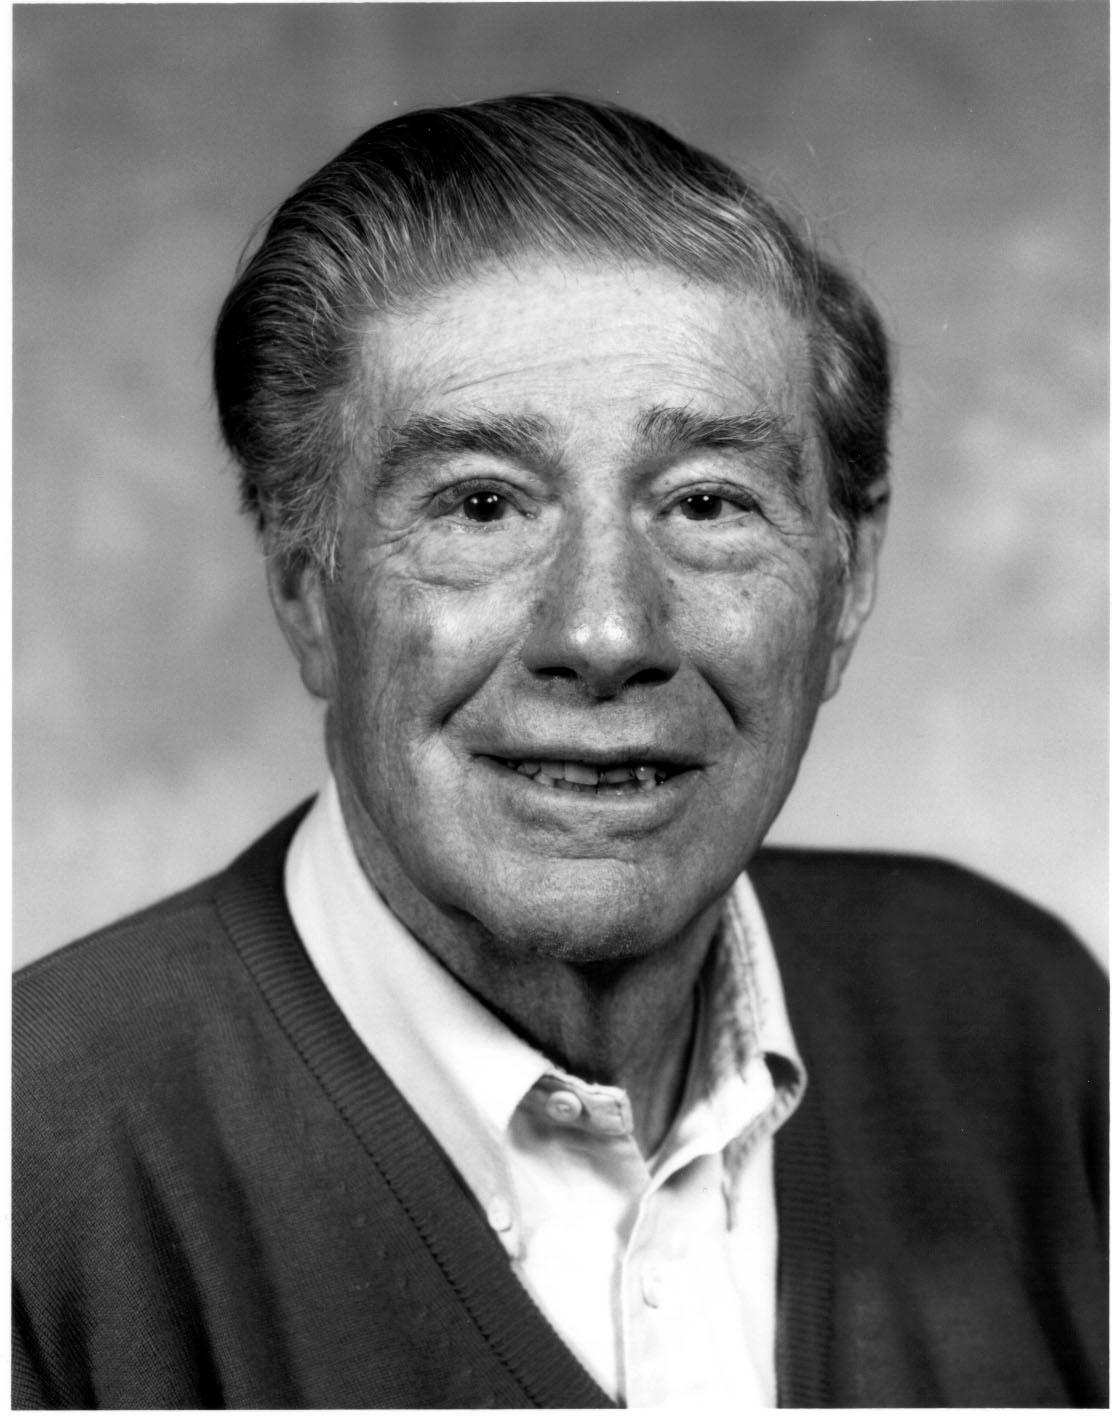 Stanley J. Peloquin